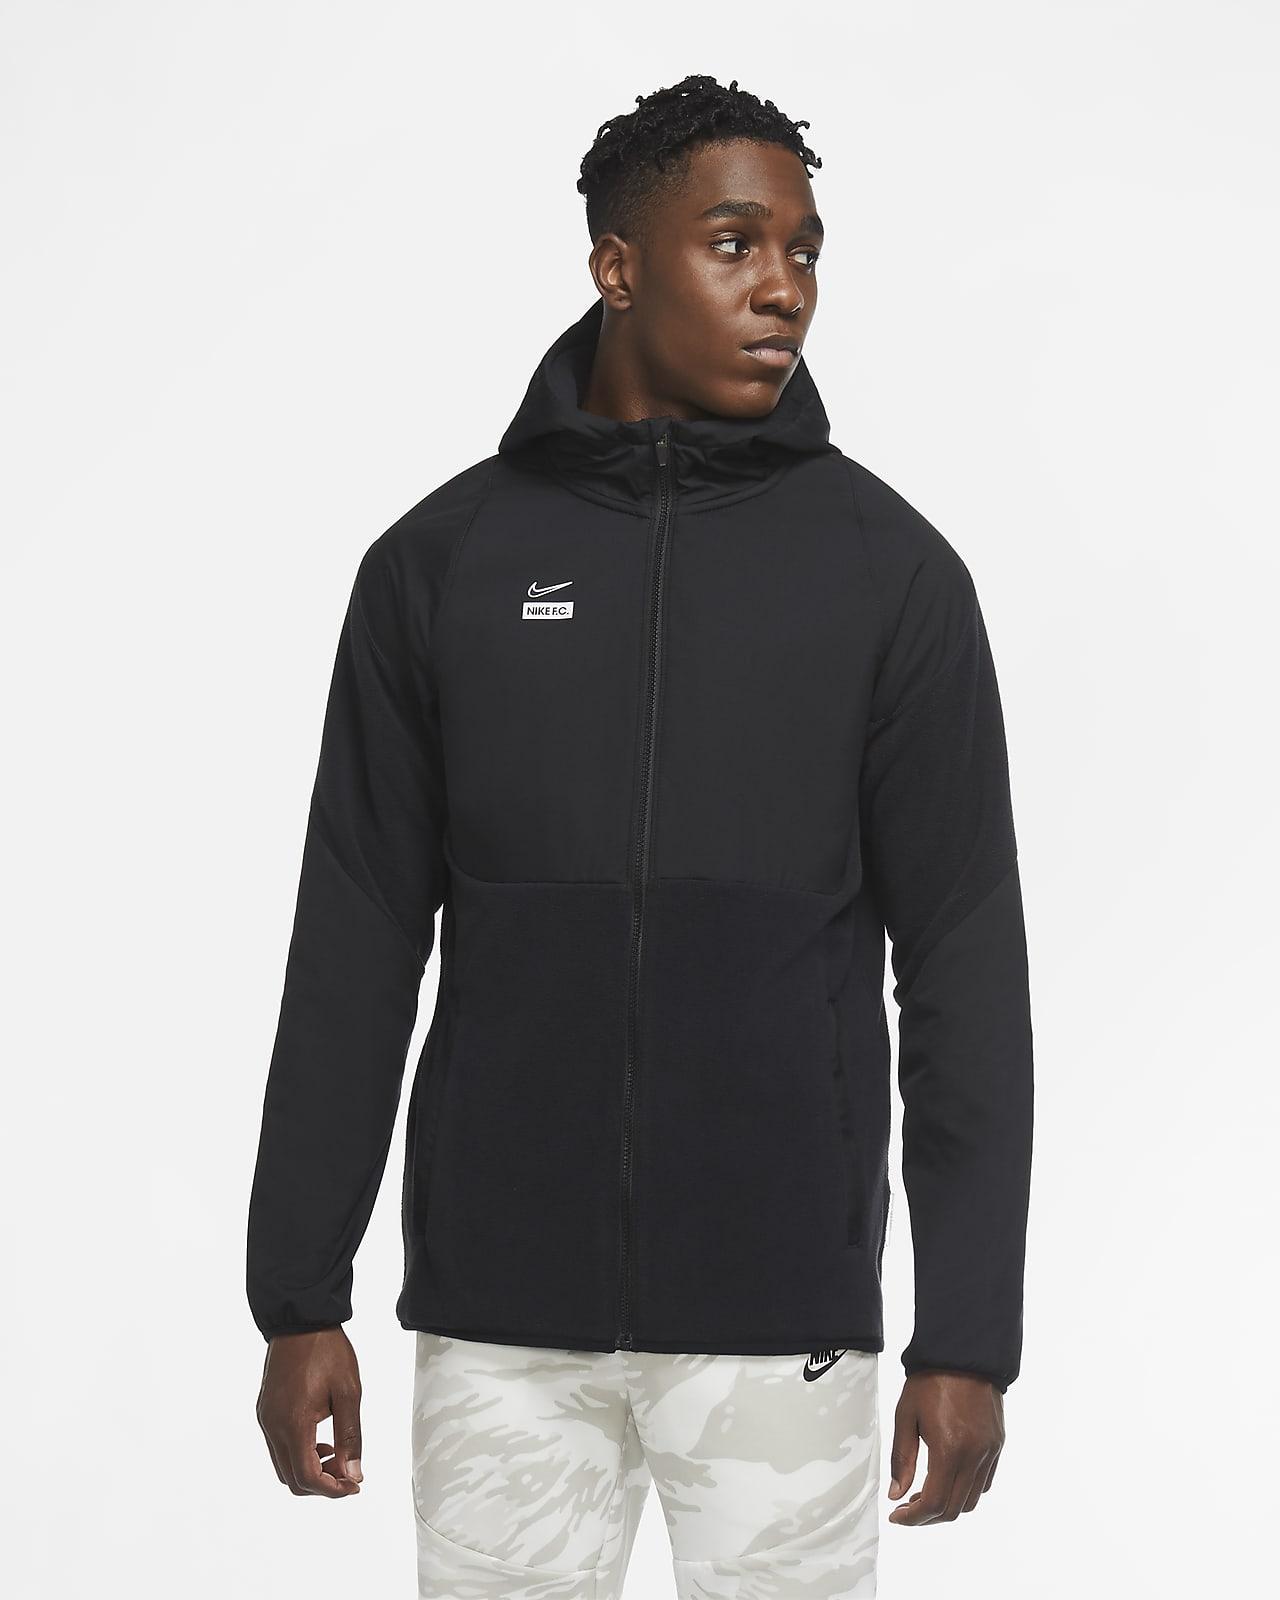 Nike F.C. AWF Men's Woven Soccer Jacket